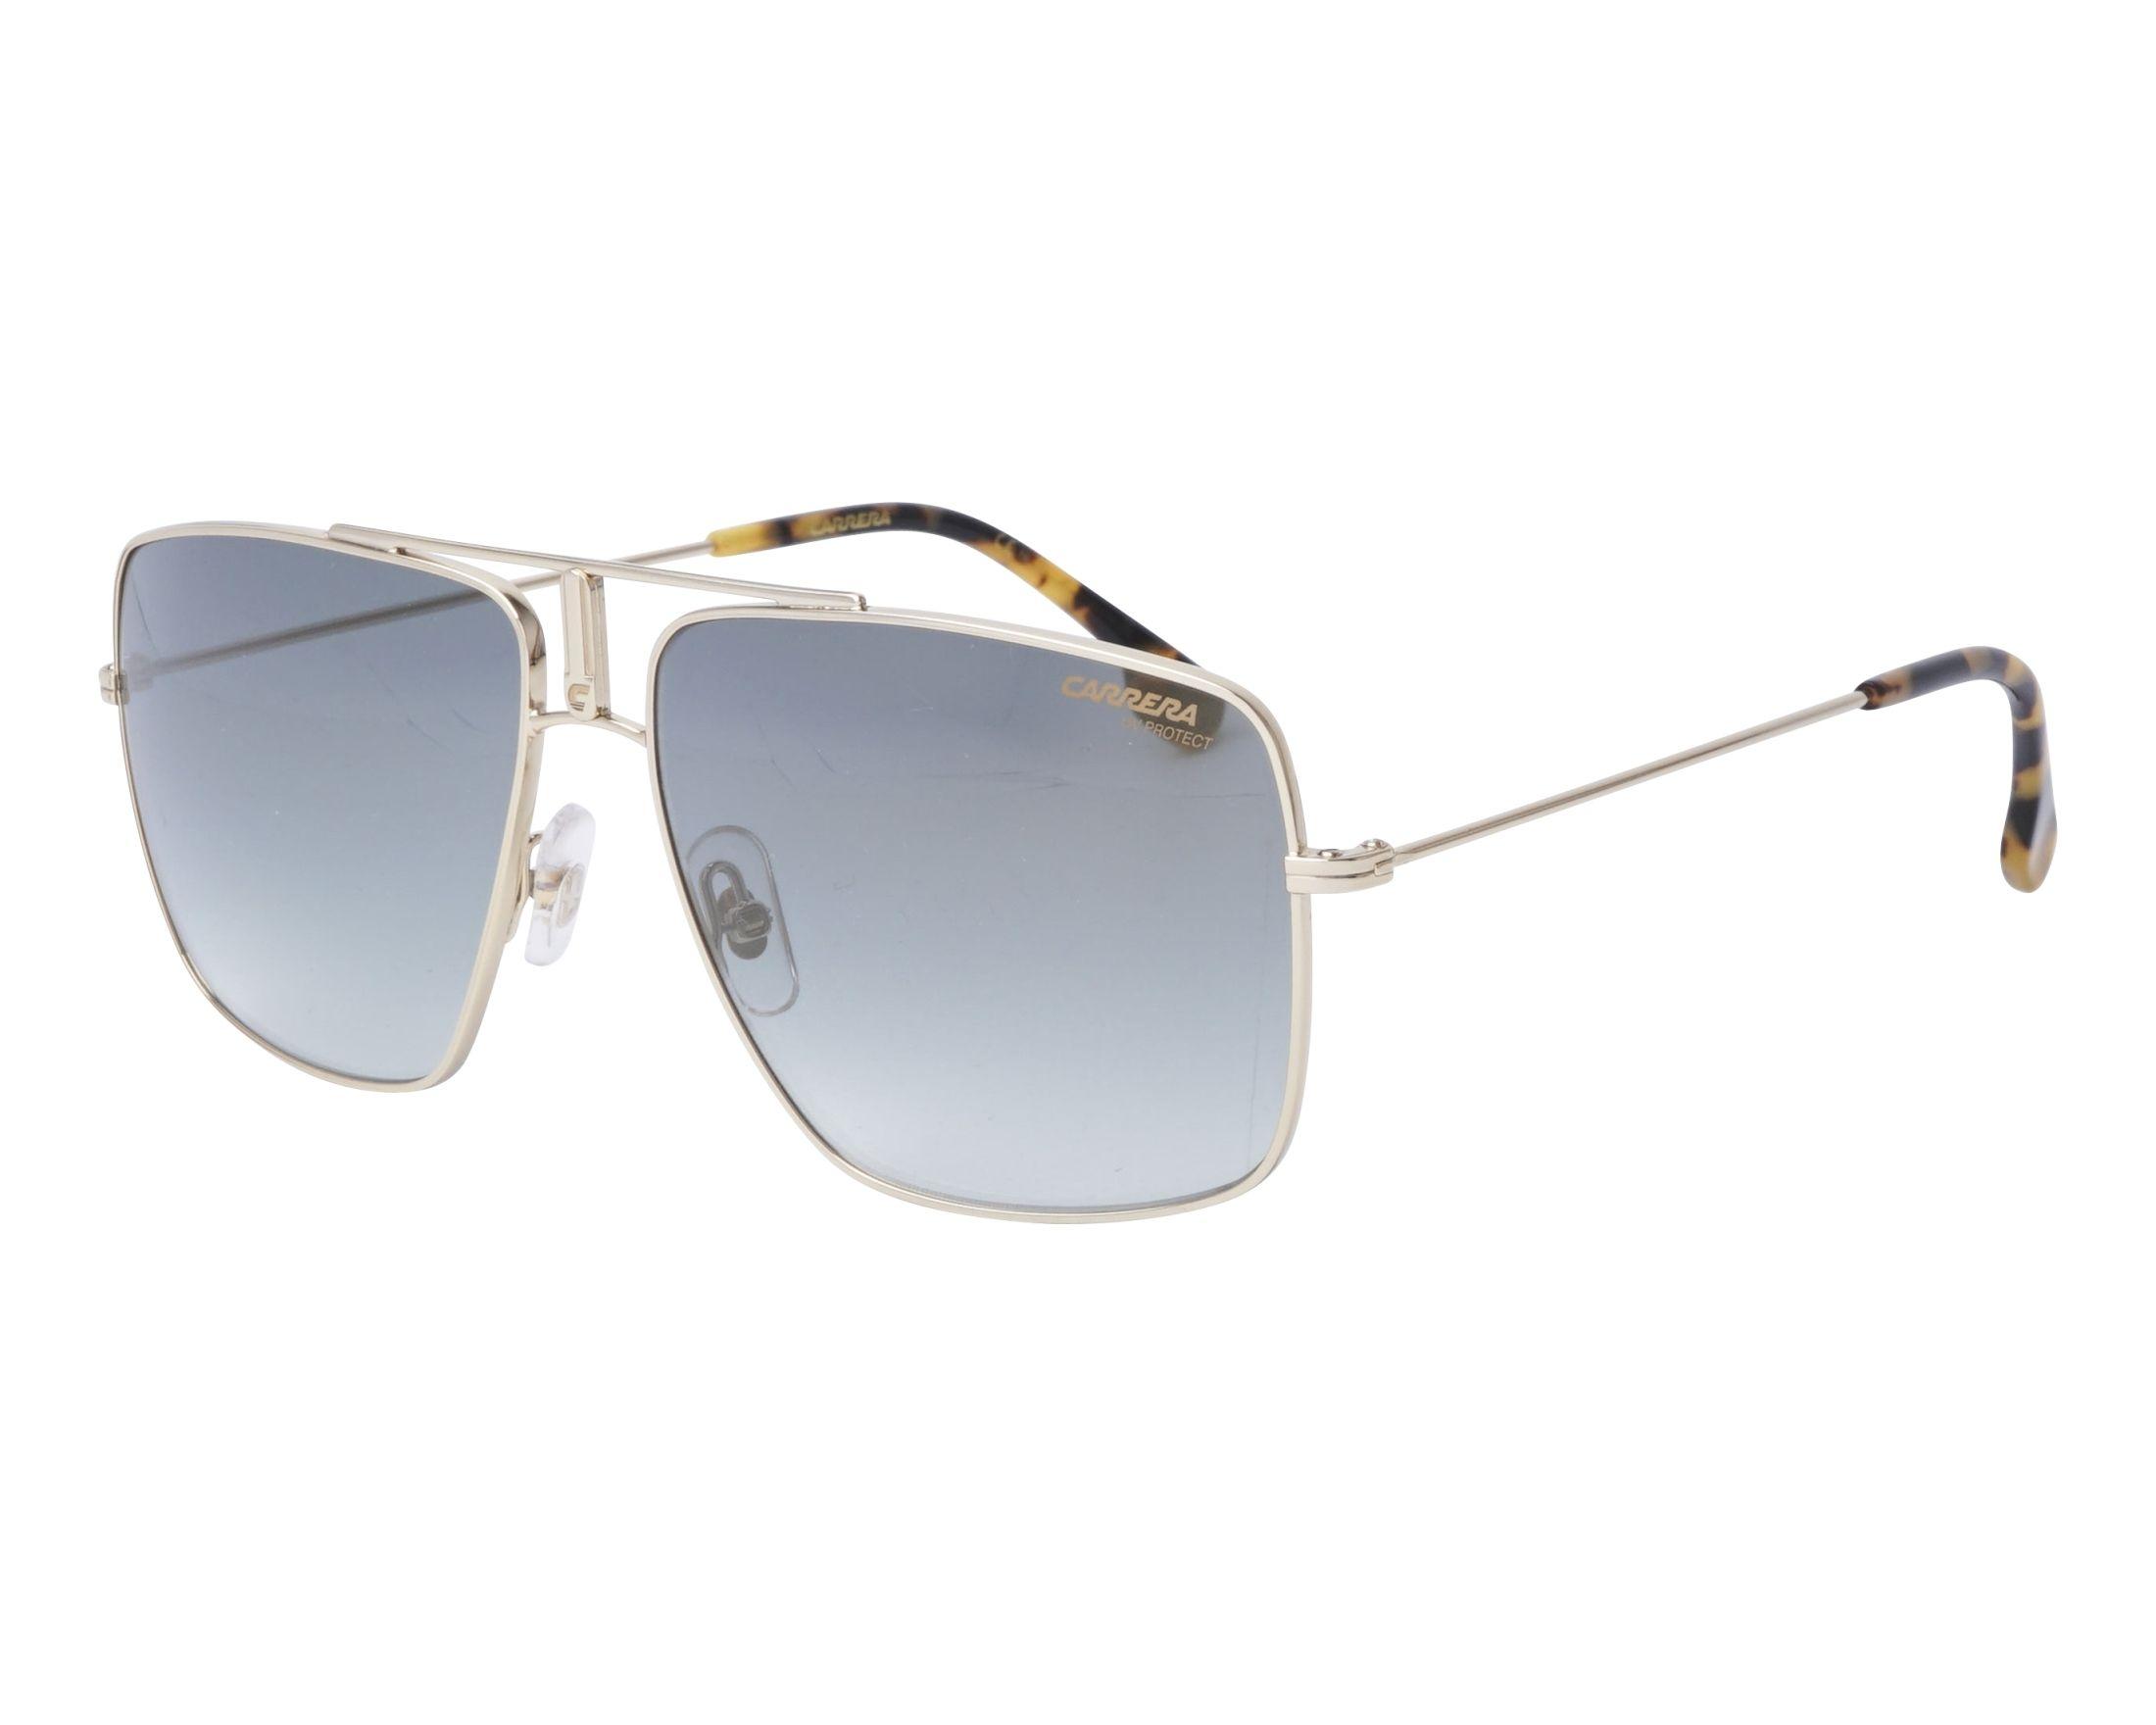 73ab2035ff11aa Sunglasses Carrera 1006-S 06JEZ 60-14 Gold Havana profile view